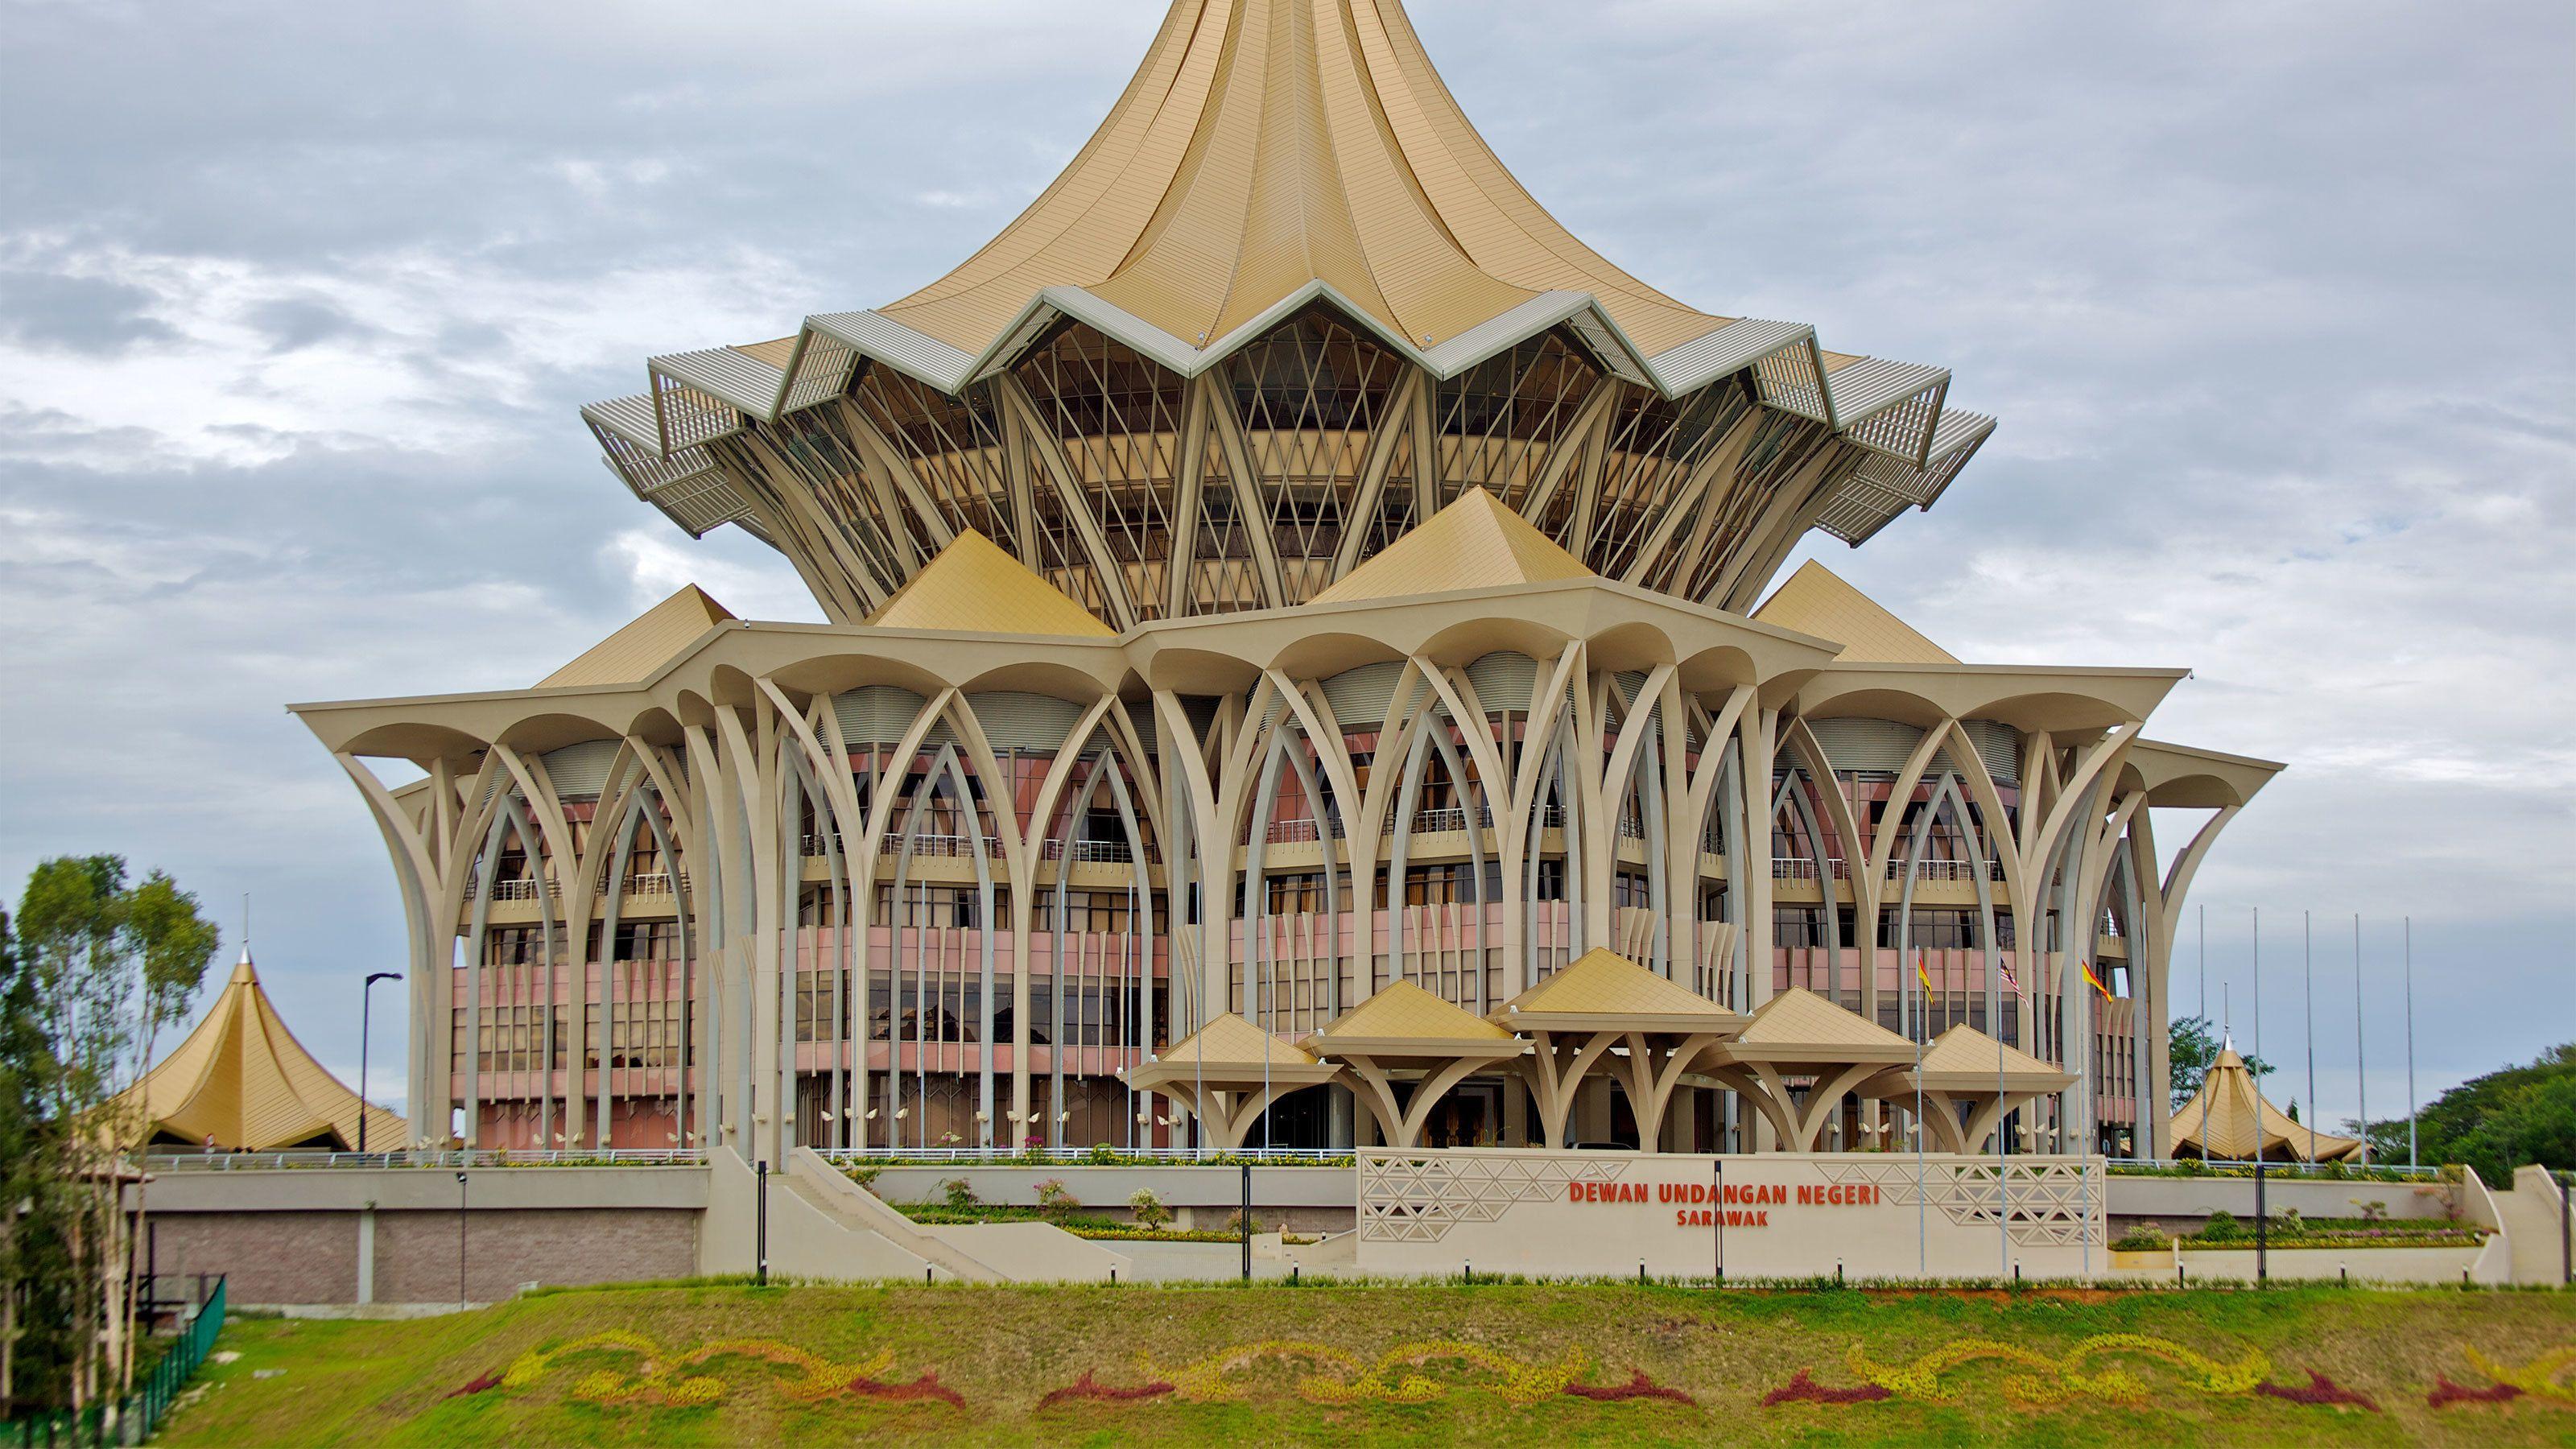 New Sarawak State Legislative Assembly Building in Malaysia